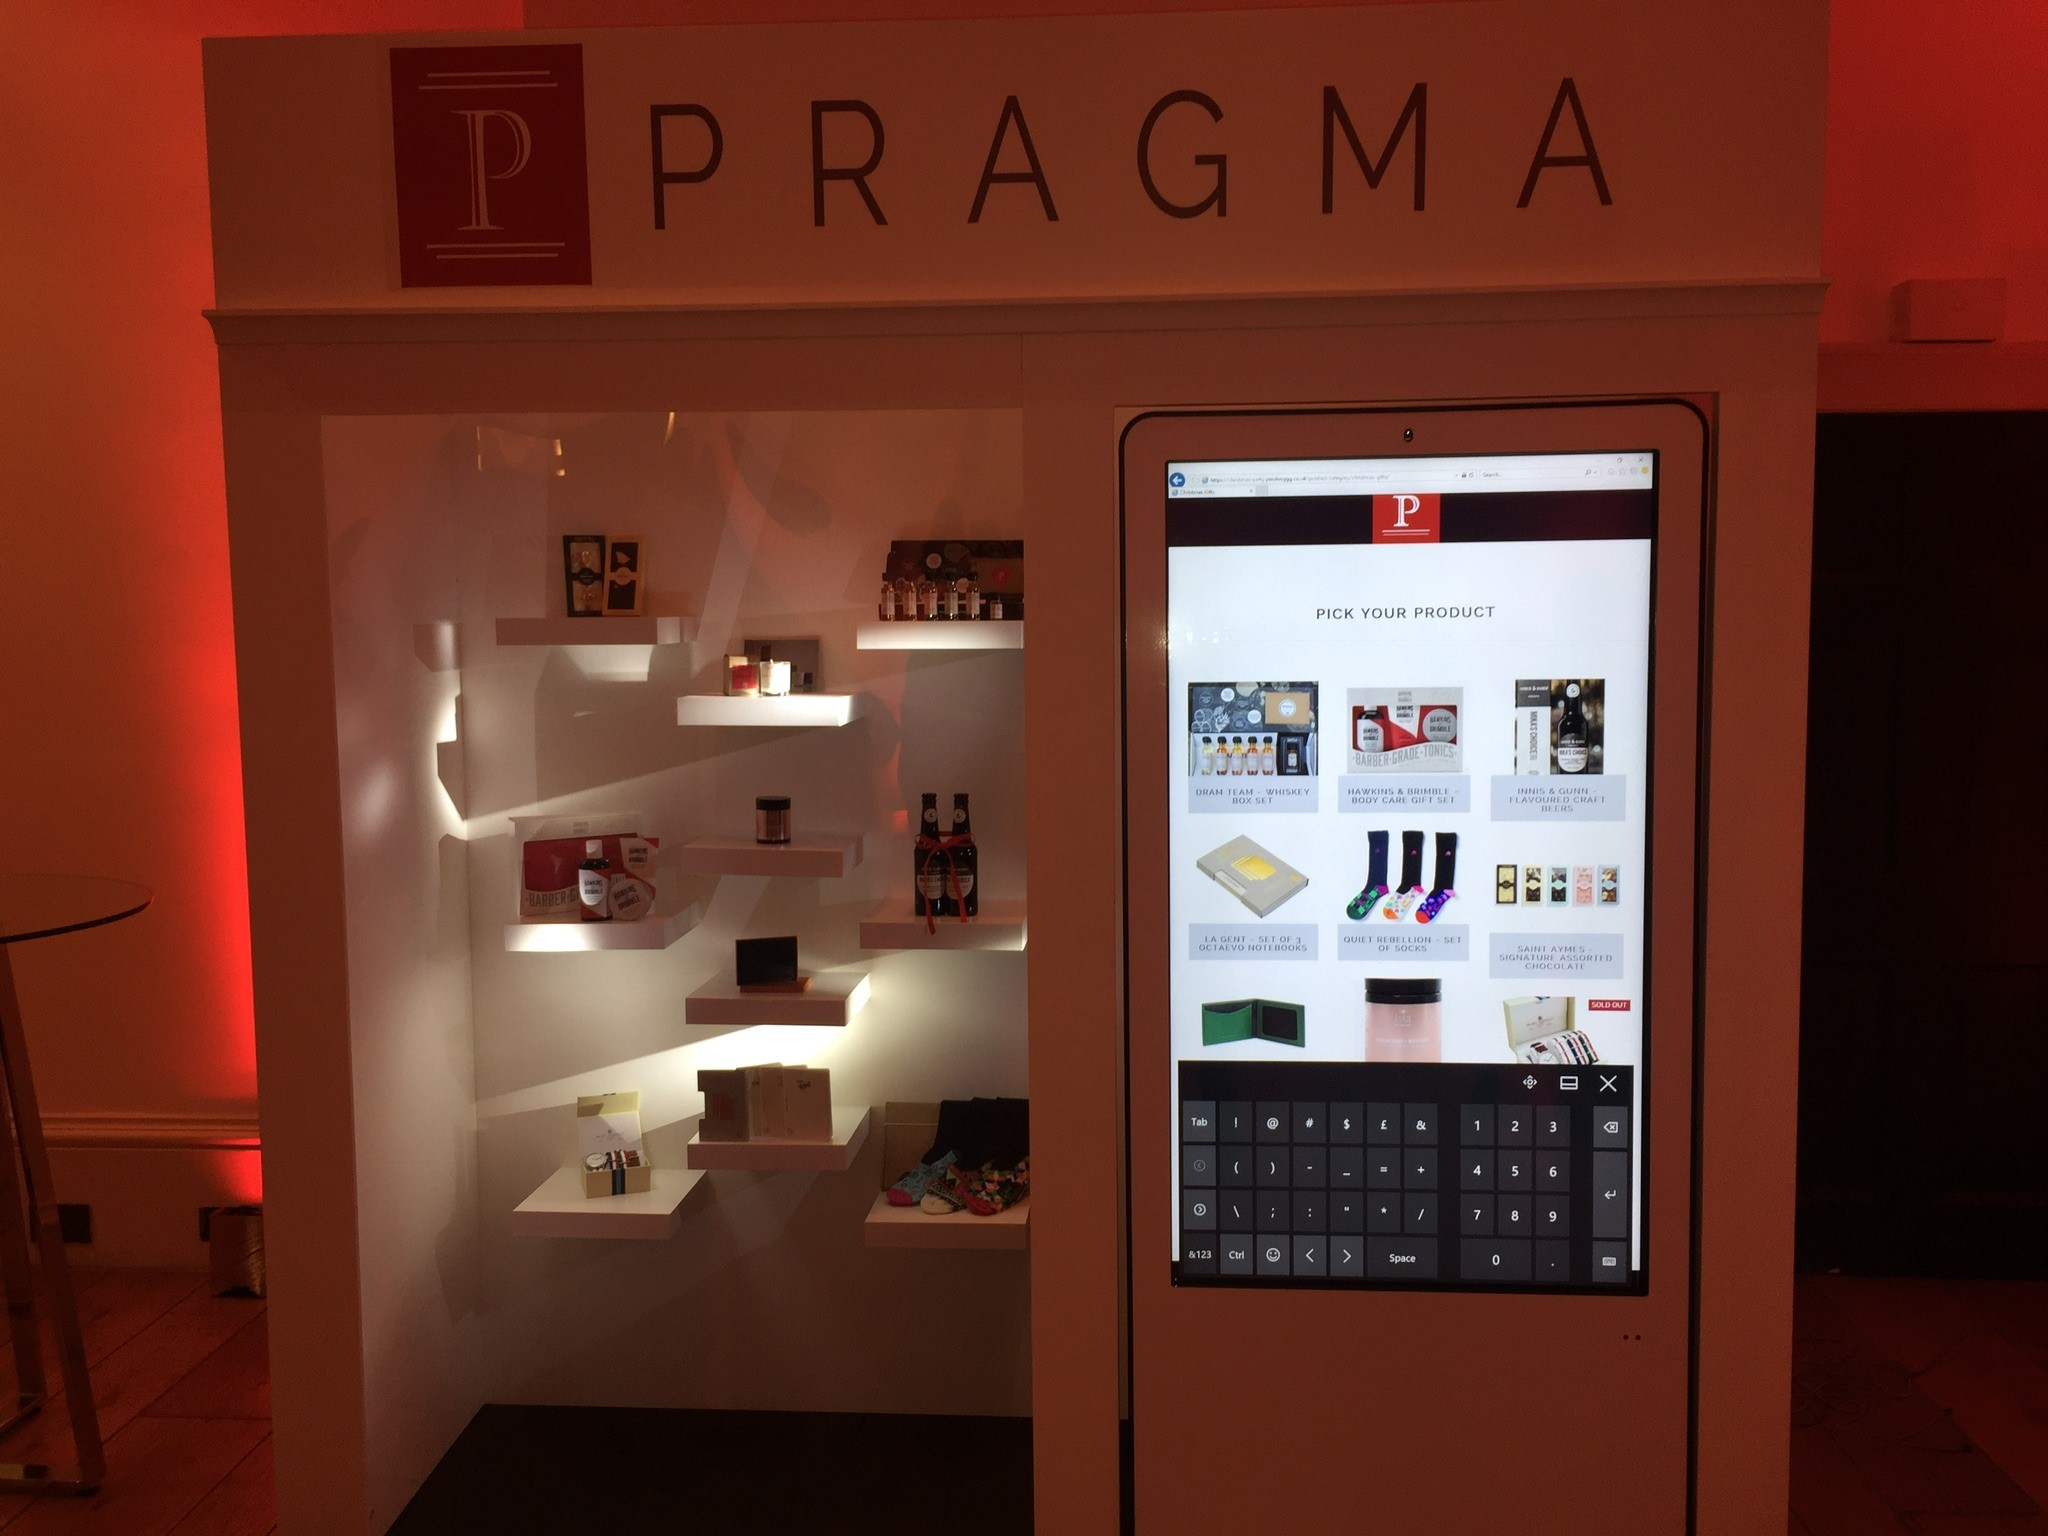 pragma kiosk.jpg